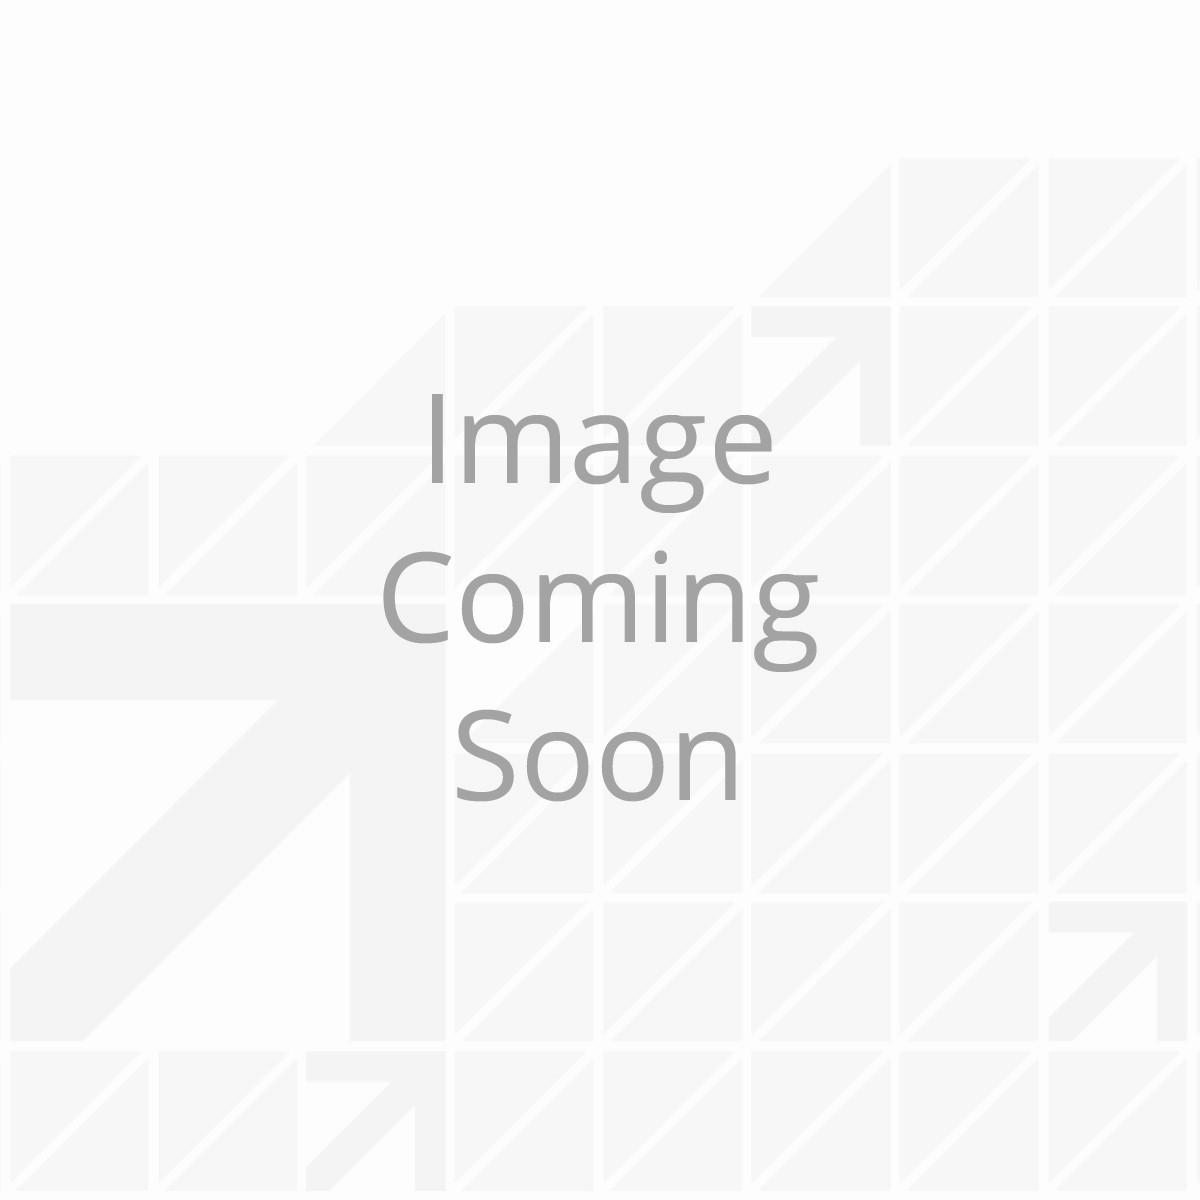 hydac-catridge-valve-ws08w-01t-c-n-0